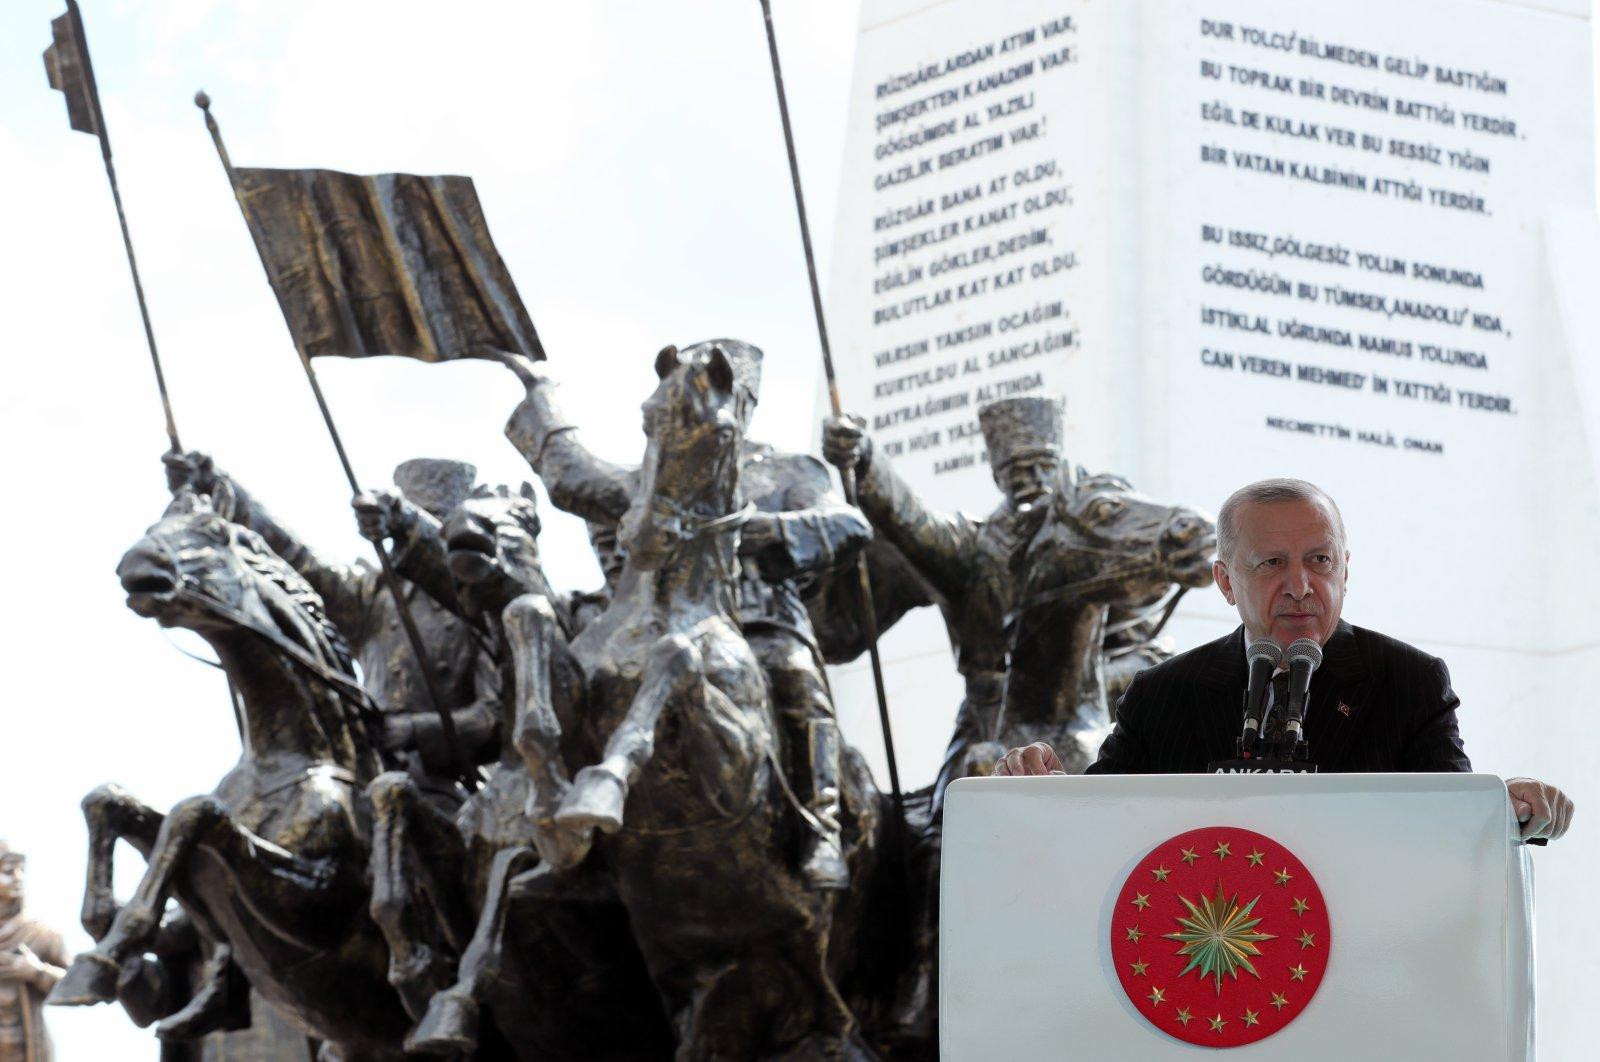 President Recep Tayyip Erdoğan speaks in front of a monument for fallen soldiers of Sakarya, in the capital Ankara, Turkey, Sept. 13, 2021. (AA PHOTO)